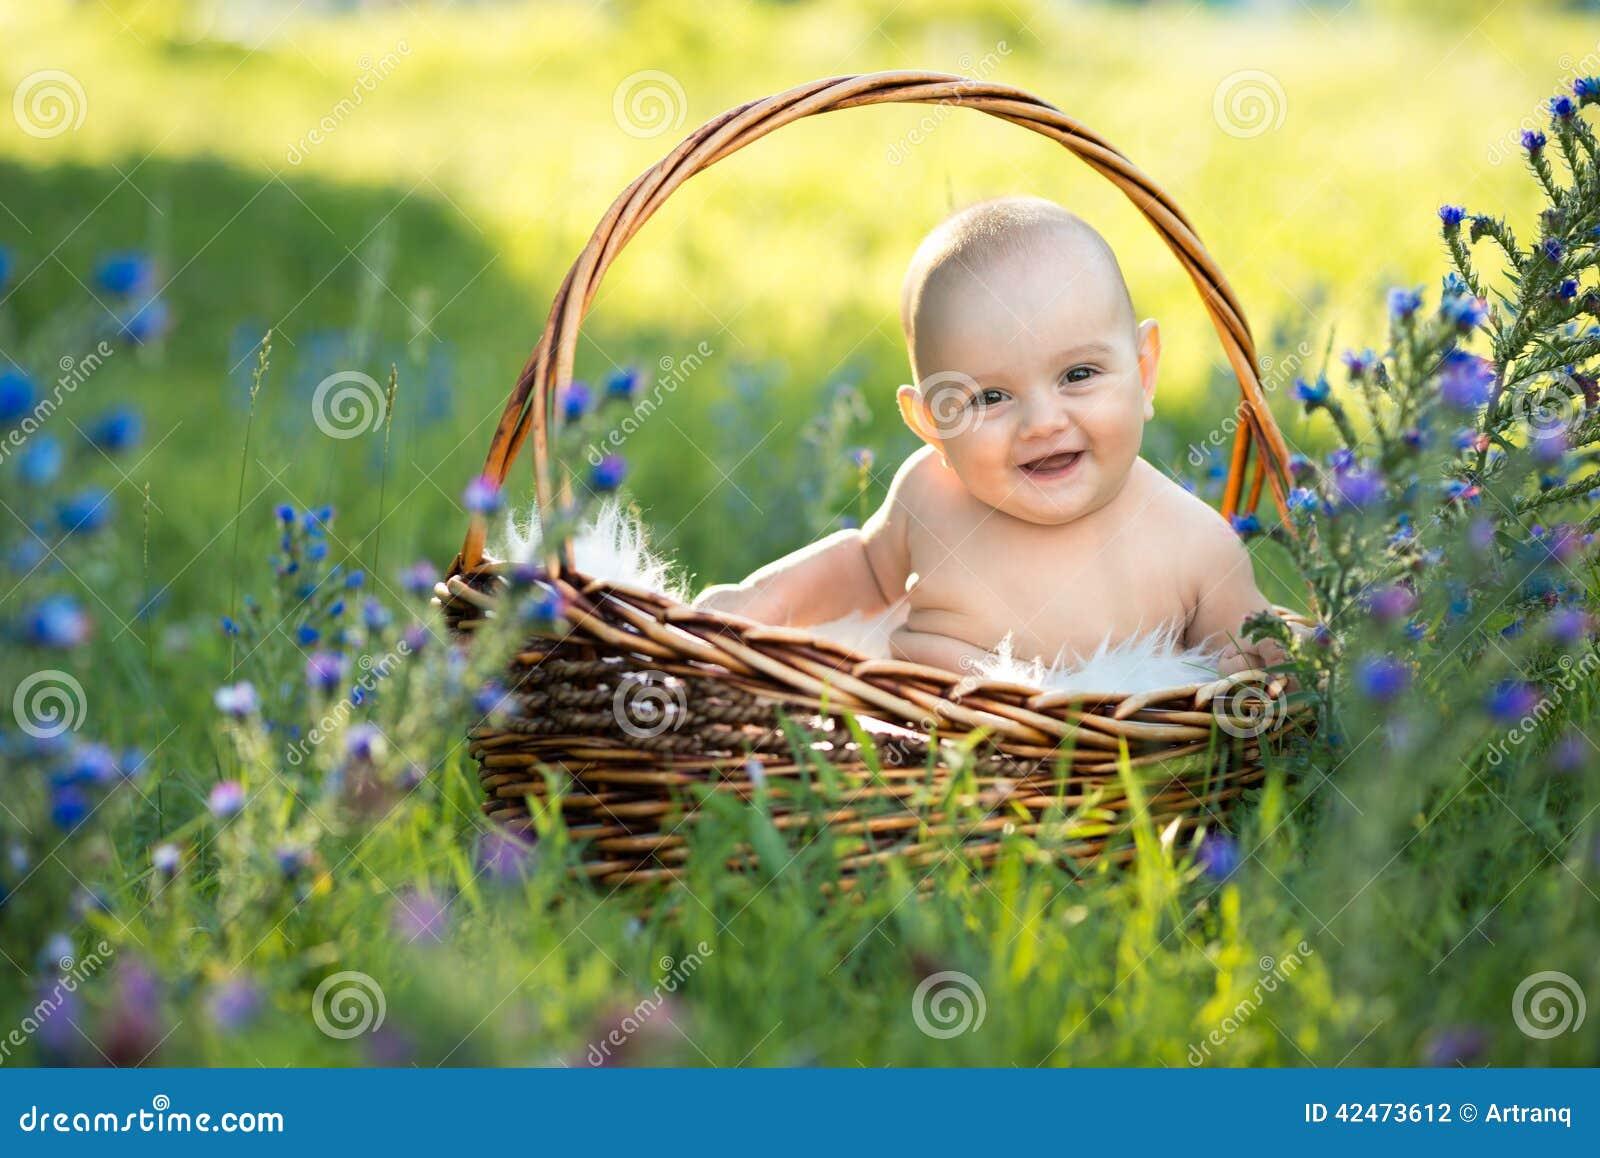 child naked  Small naked smiling child ...